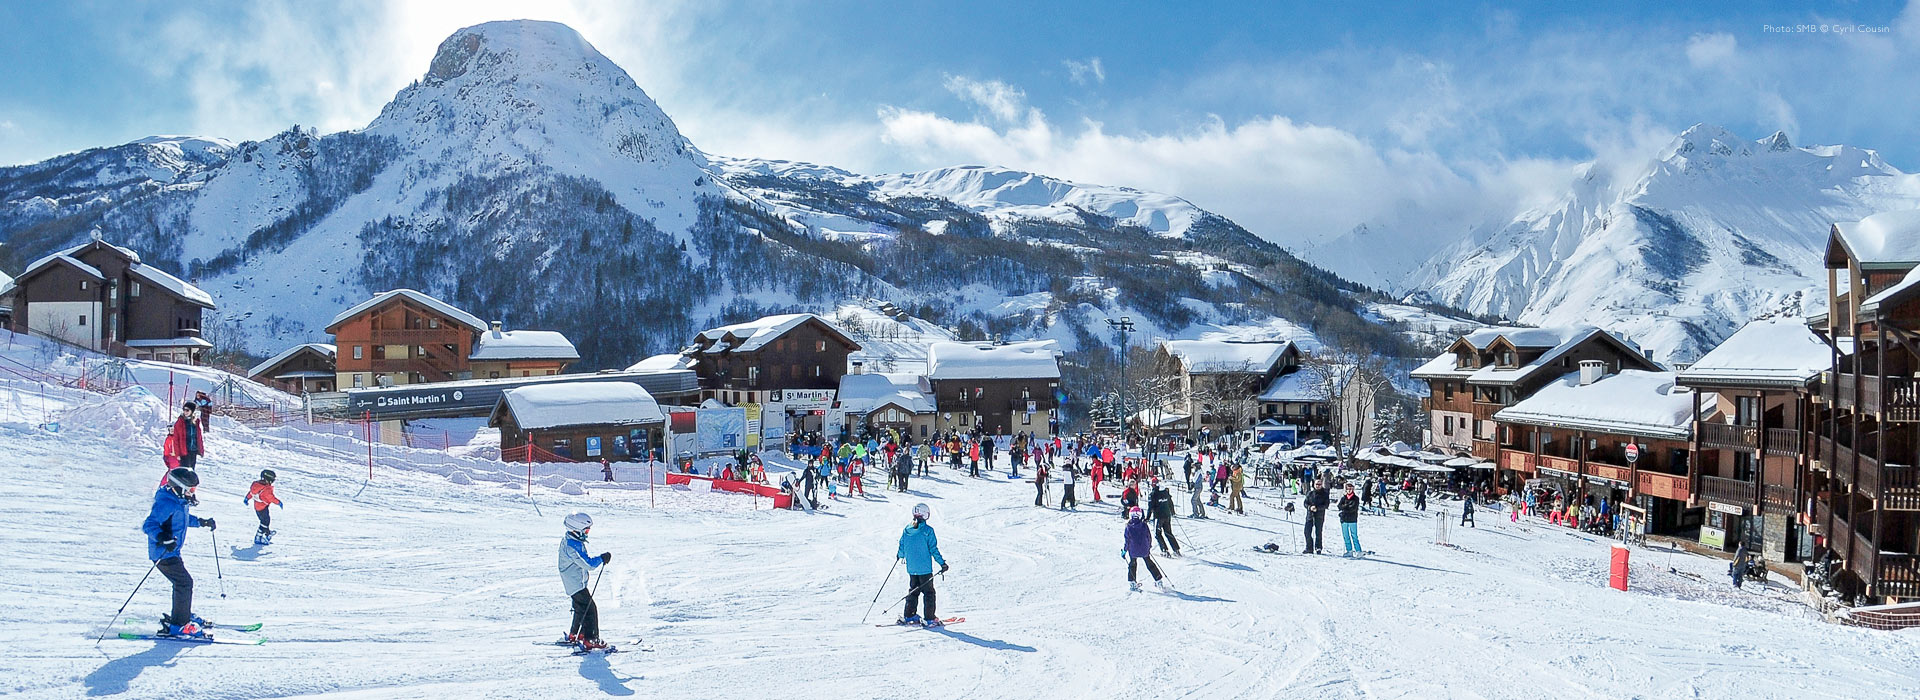 Wide view of skiers returning to ski resort of Saint-Martin de Belleville.